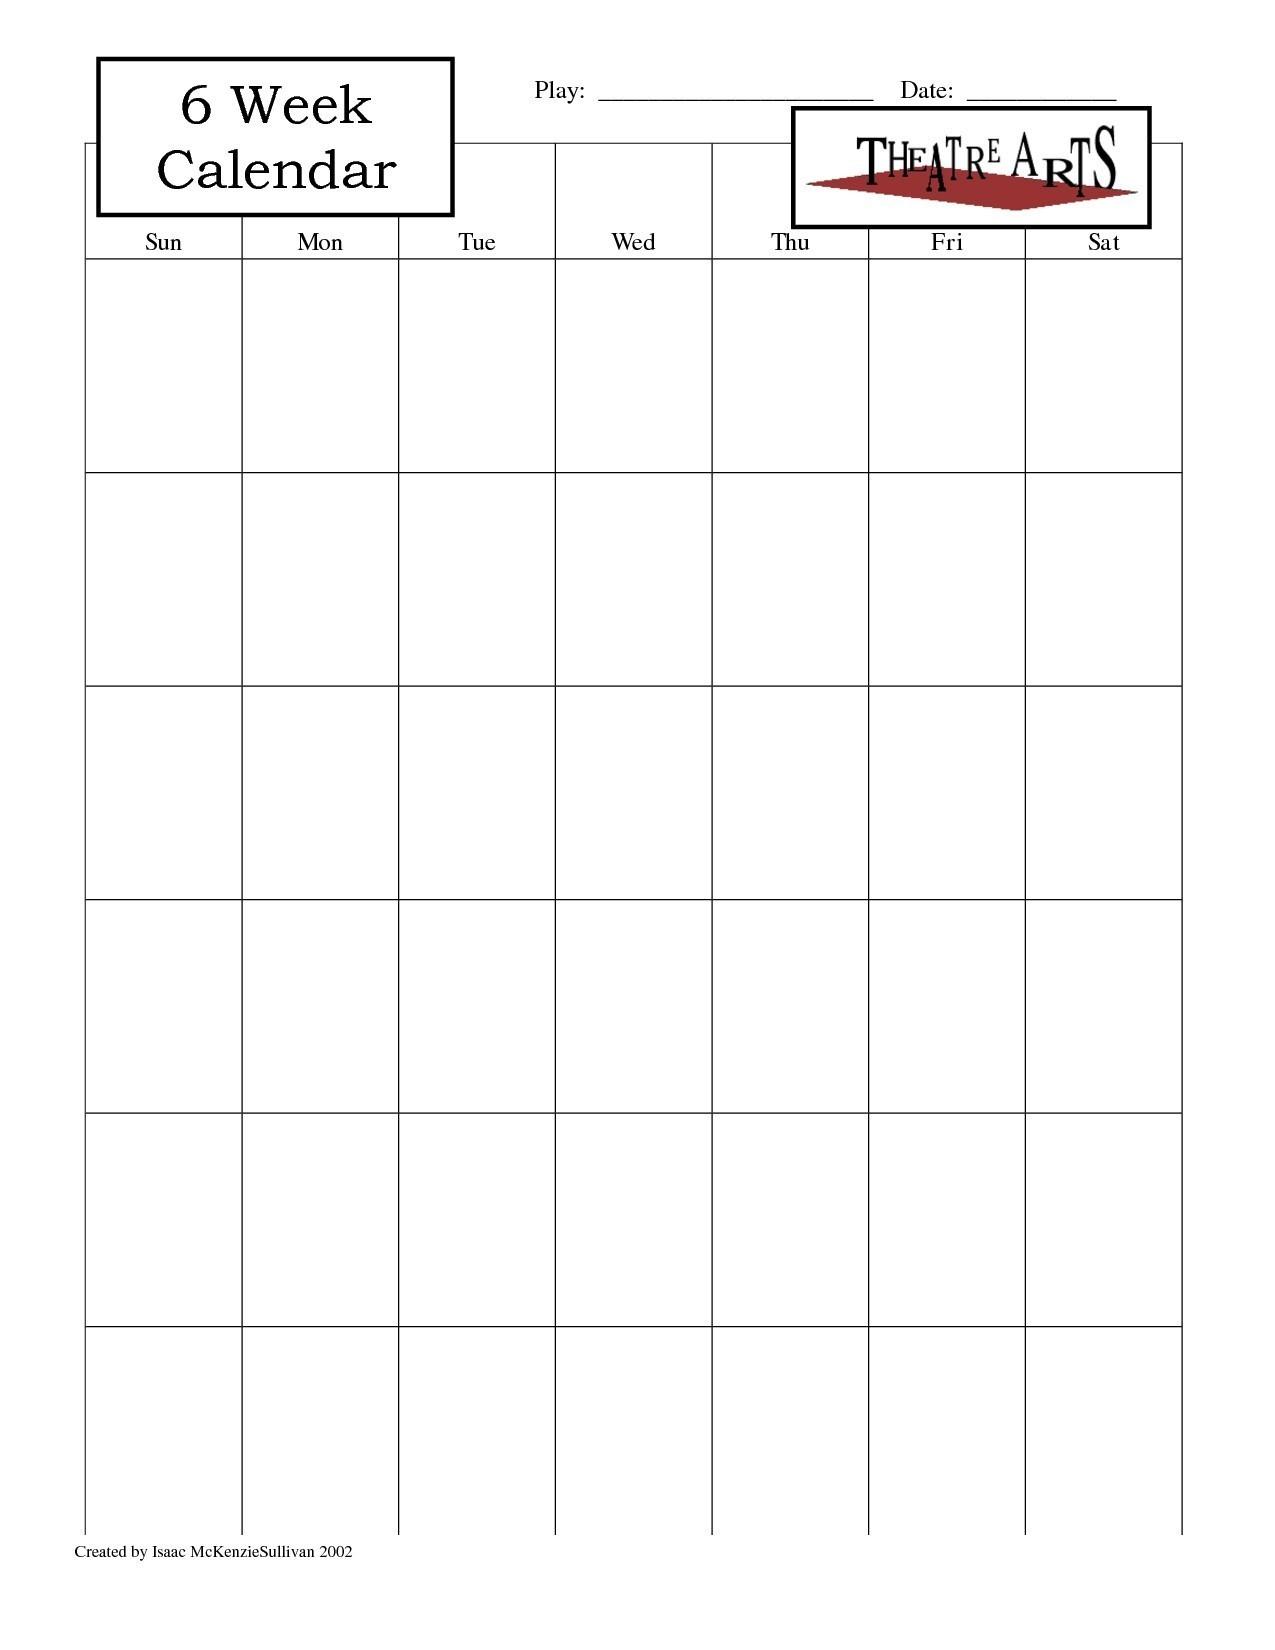 Blank 6 Week Calendar | Thekpark-Hadong 6 Week Blank Calendar Template